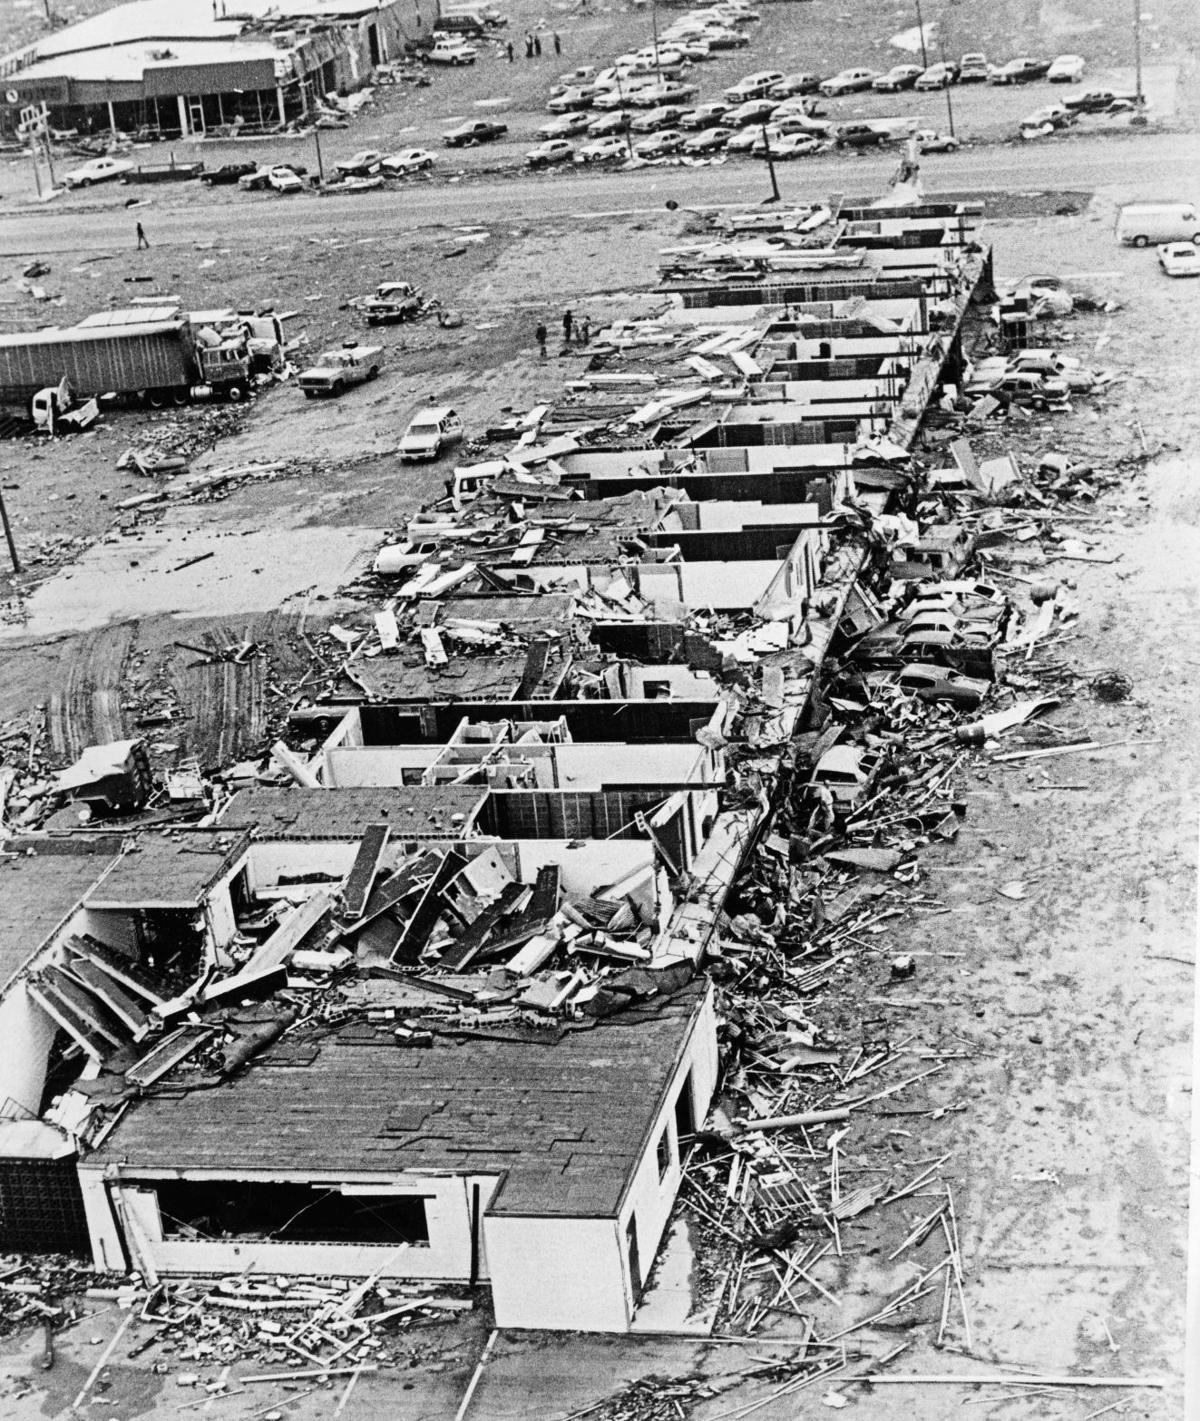 Grand Island tornadoes